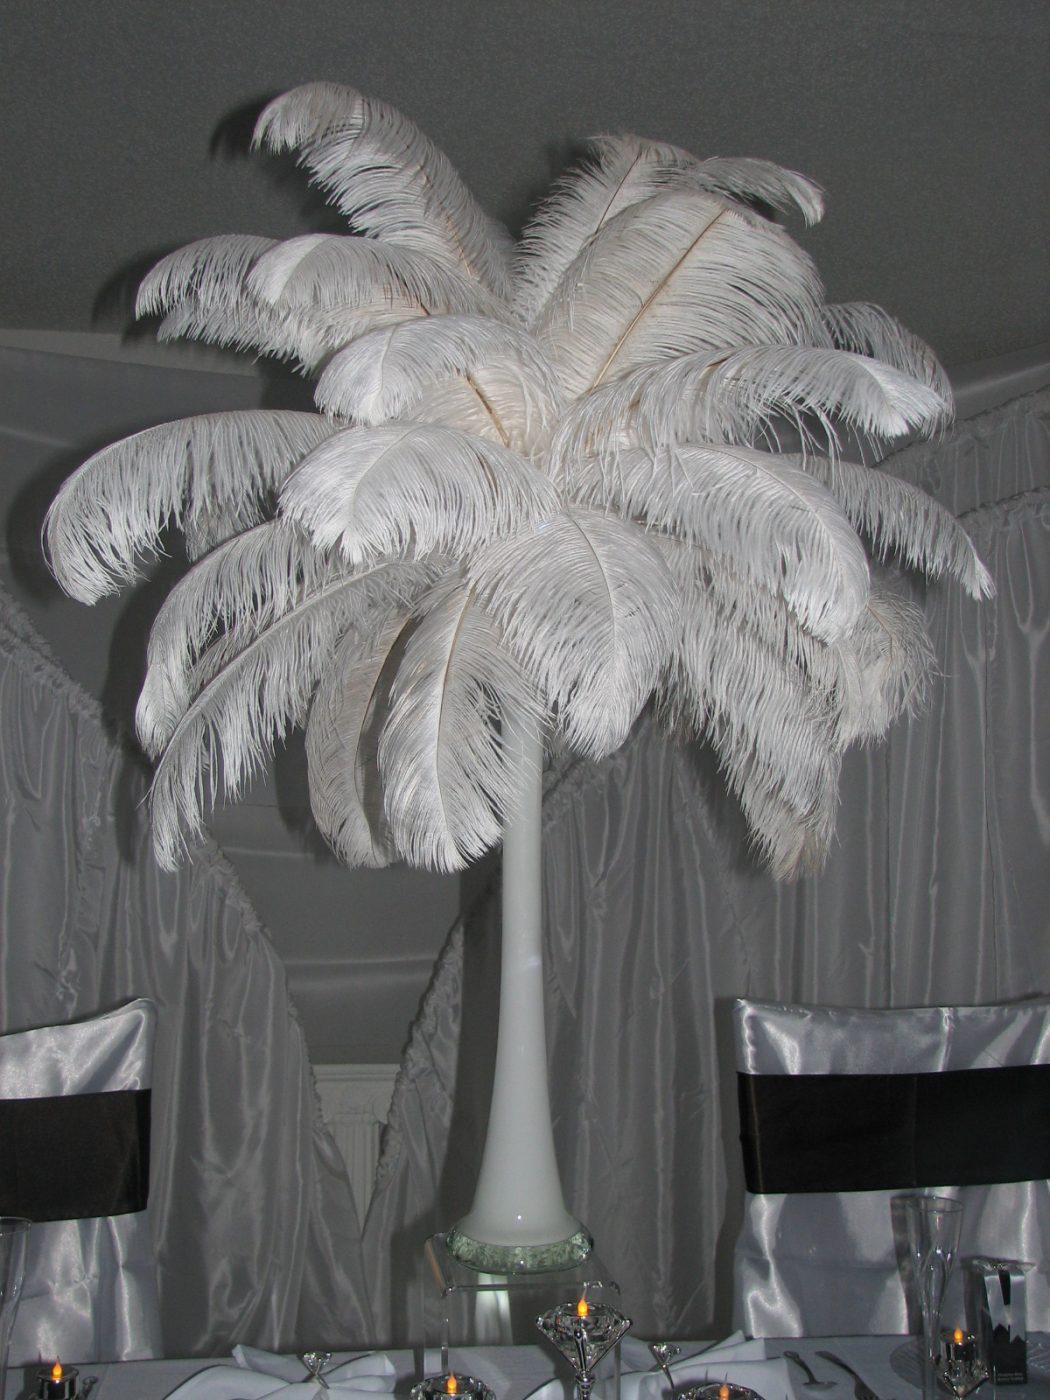 Wedding-Rent Wonderful ideas for decorating your wedding